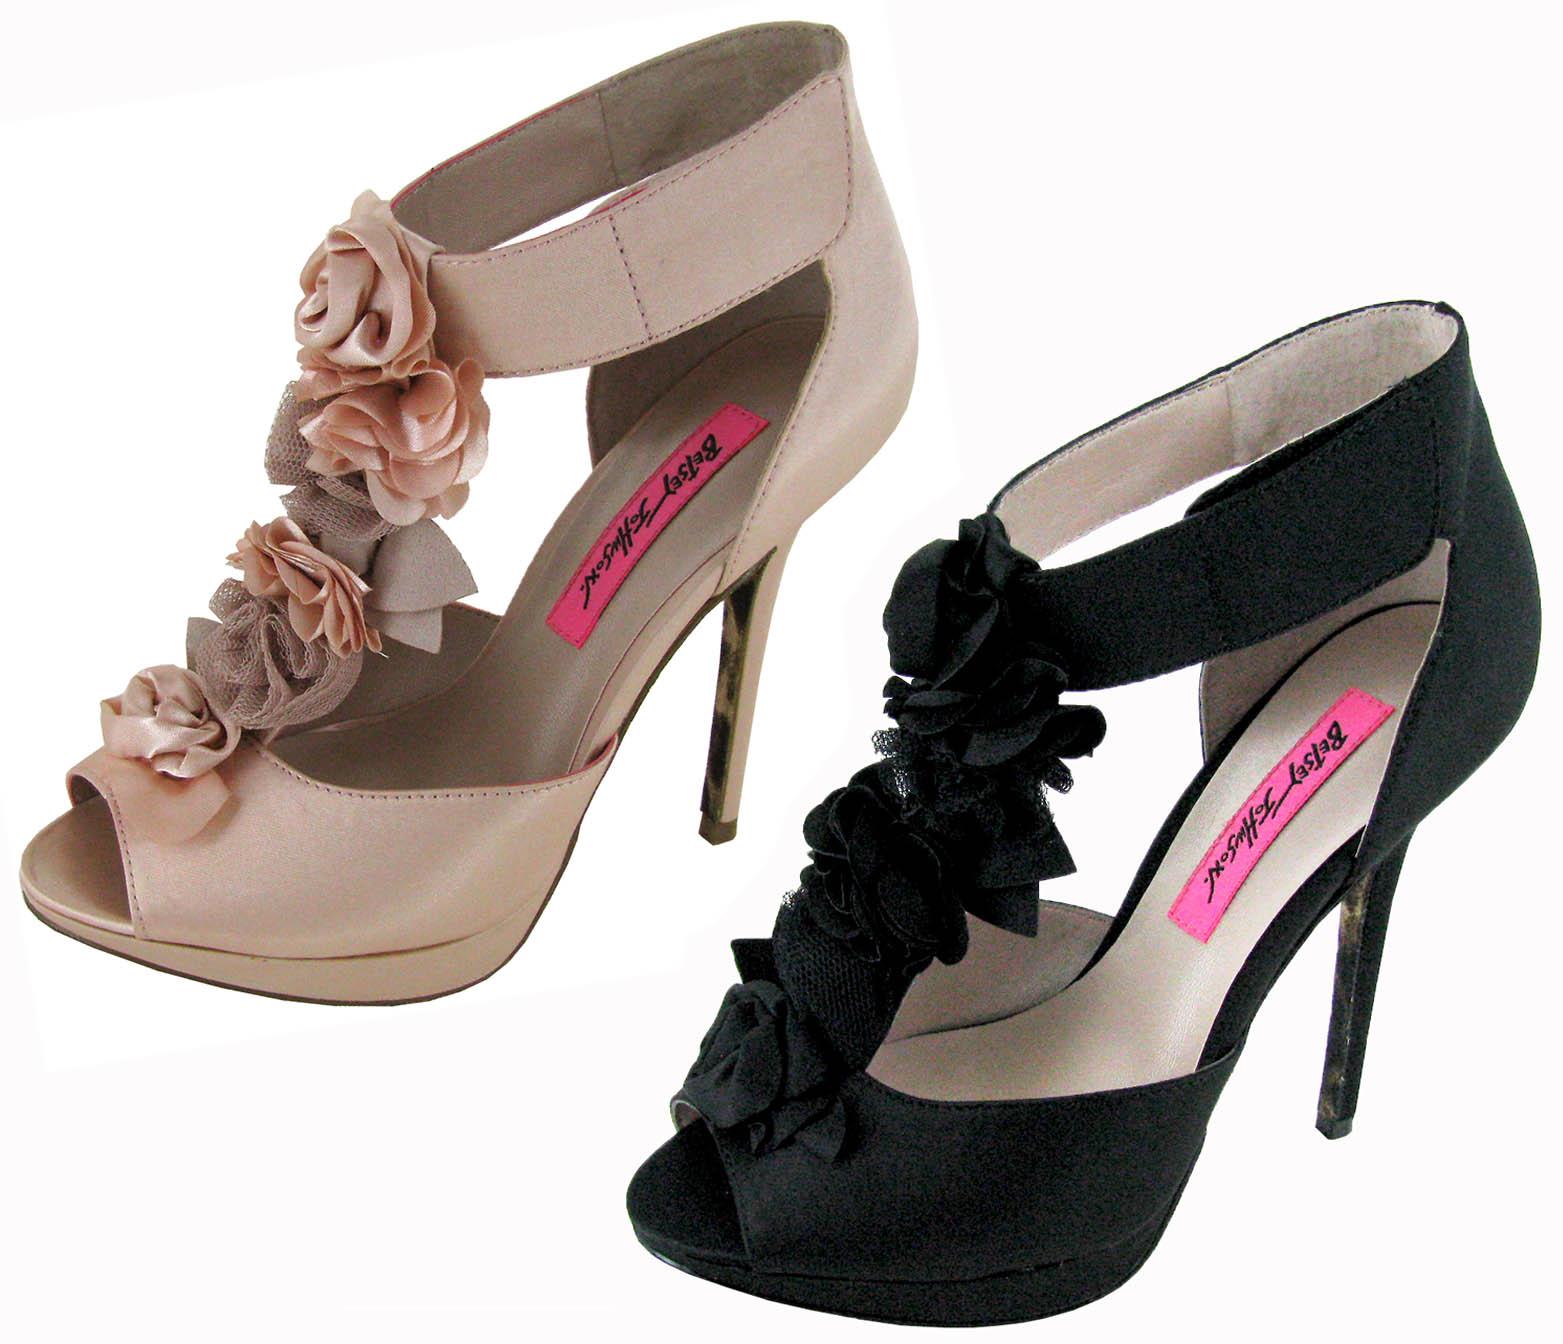 Betsey Johnson Florely Womens Platform Pump Shoes